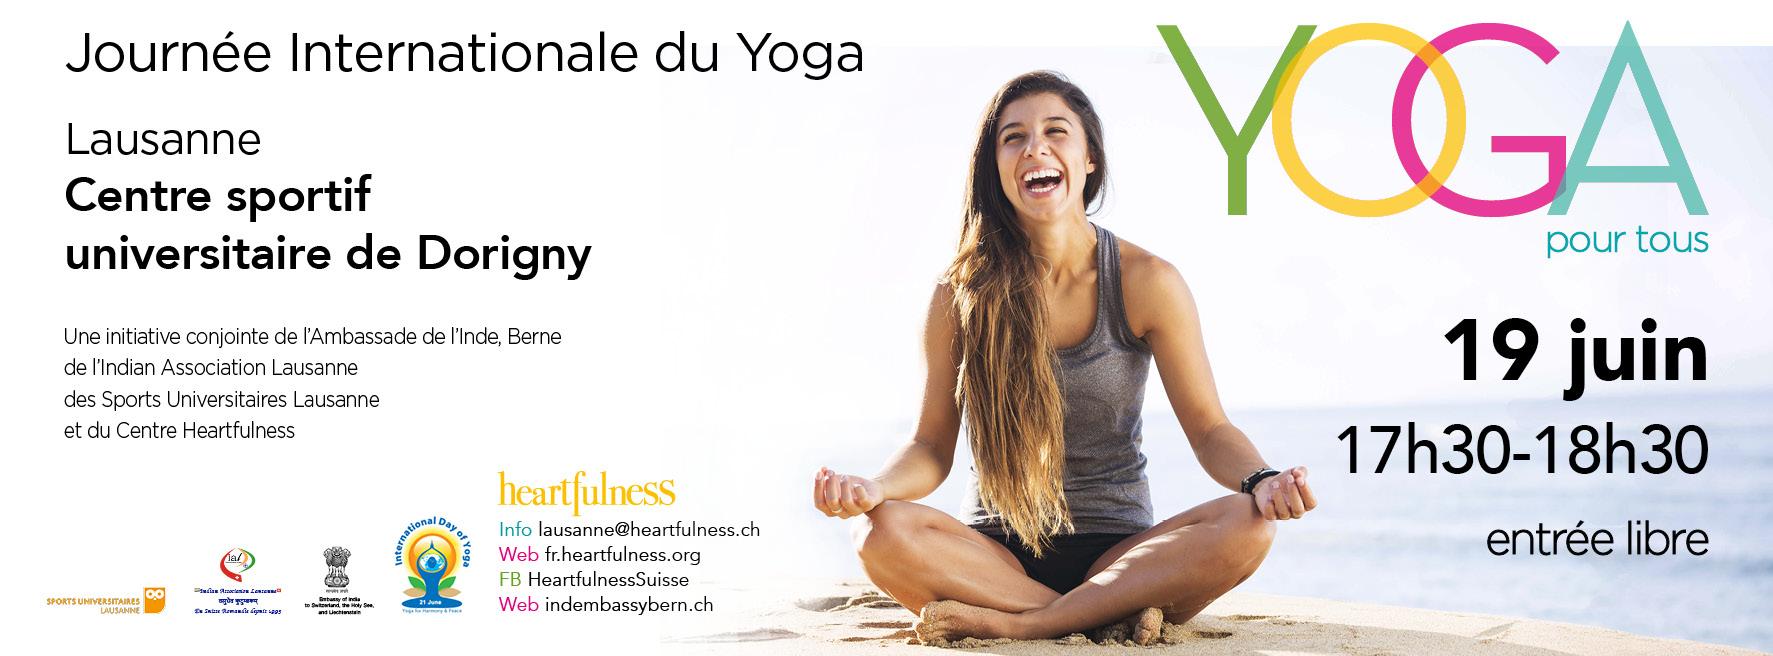 journee-internationale-yoga